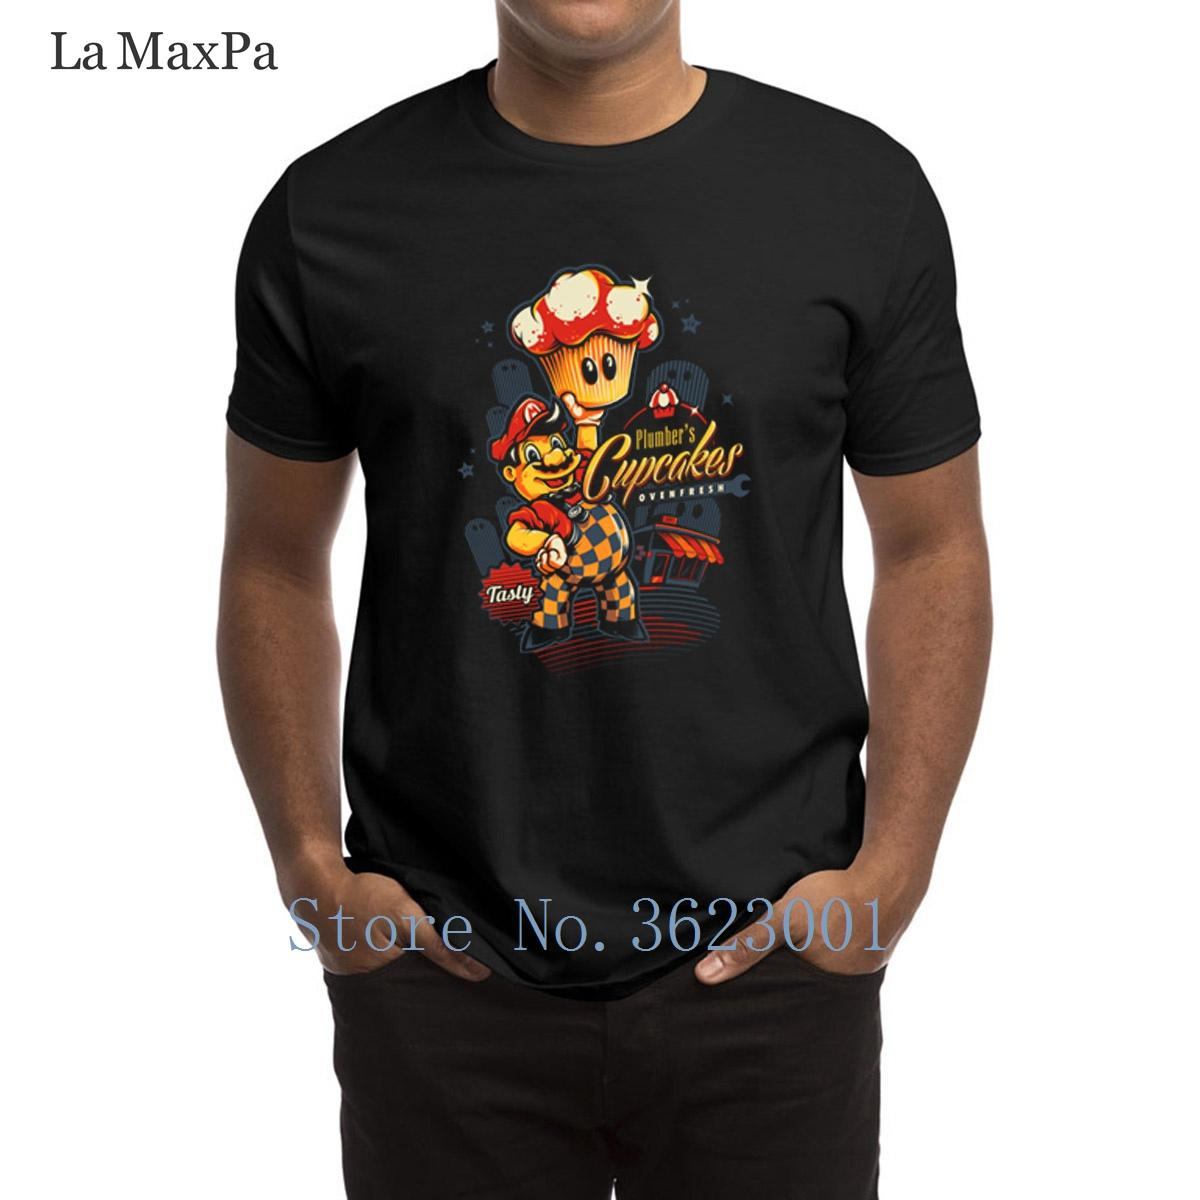 Create Cool Men T Shirt Plumber's Cupcakes Men's T-Shirt Quirky 2018 Tshirt Basic Cotton Simple Tee Shirt For Men Tee Tops